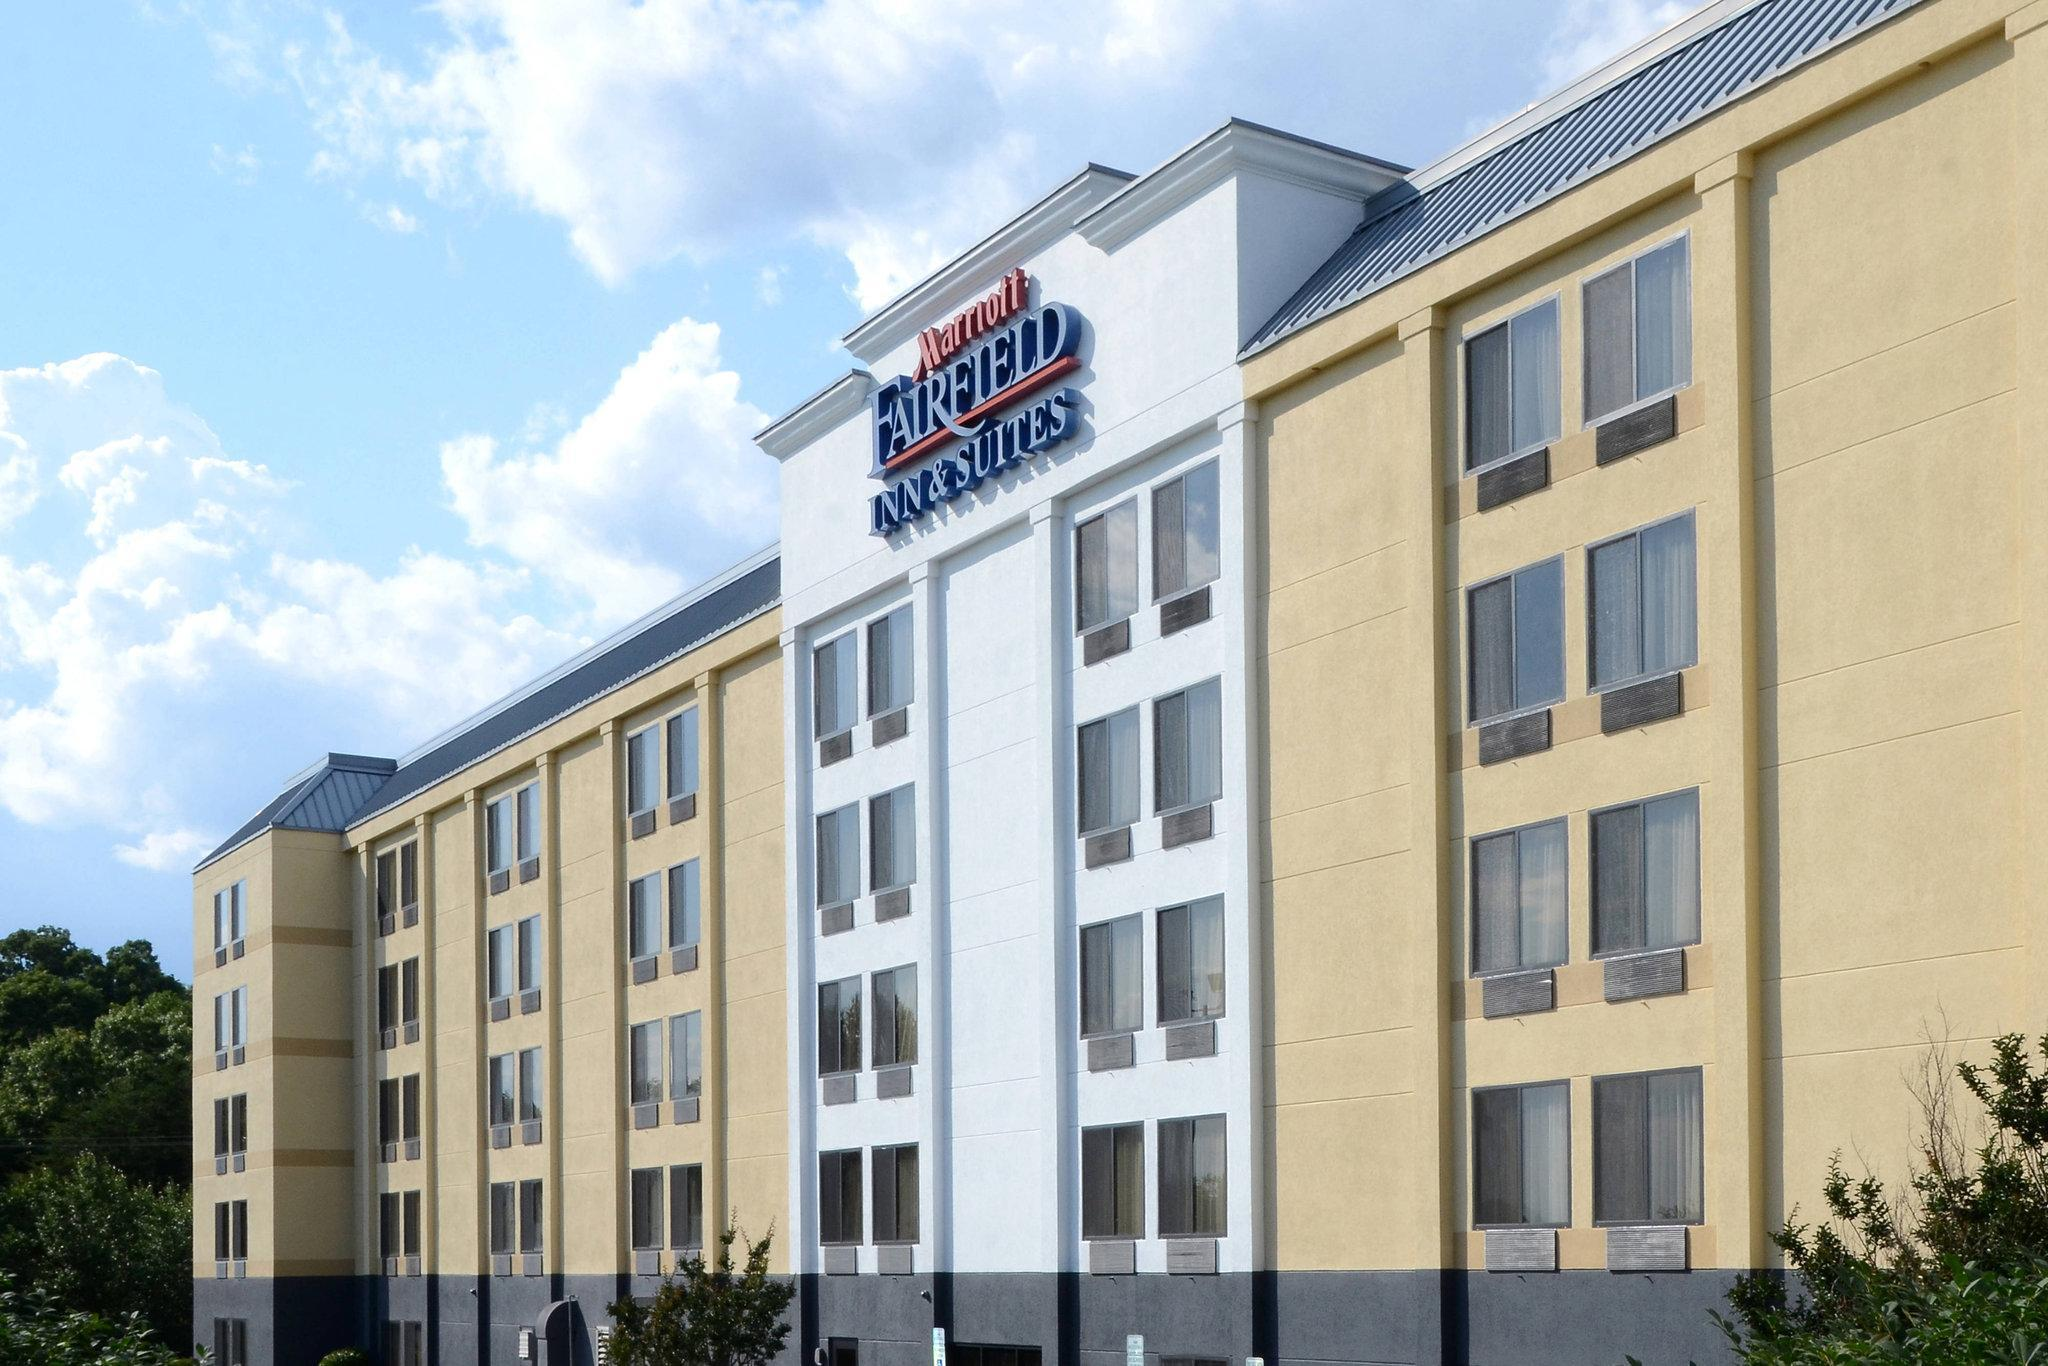 Fairfield Inn And Suites Winston Salem Hanes Mall